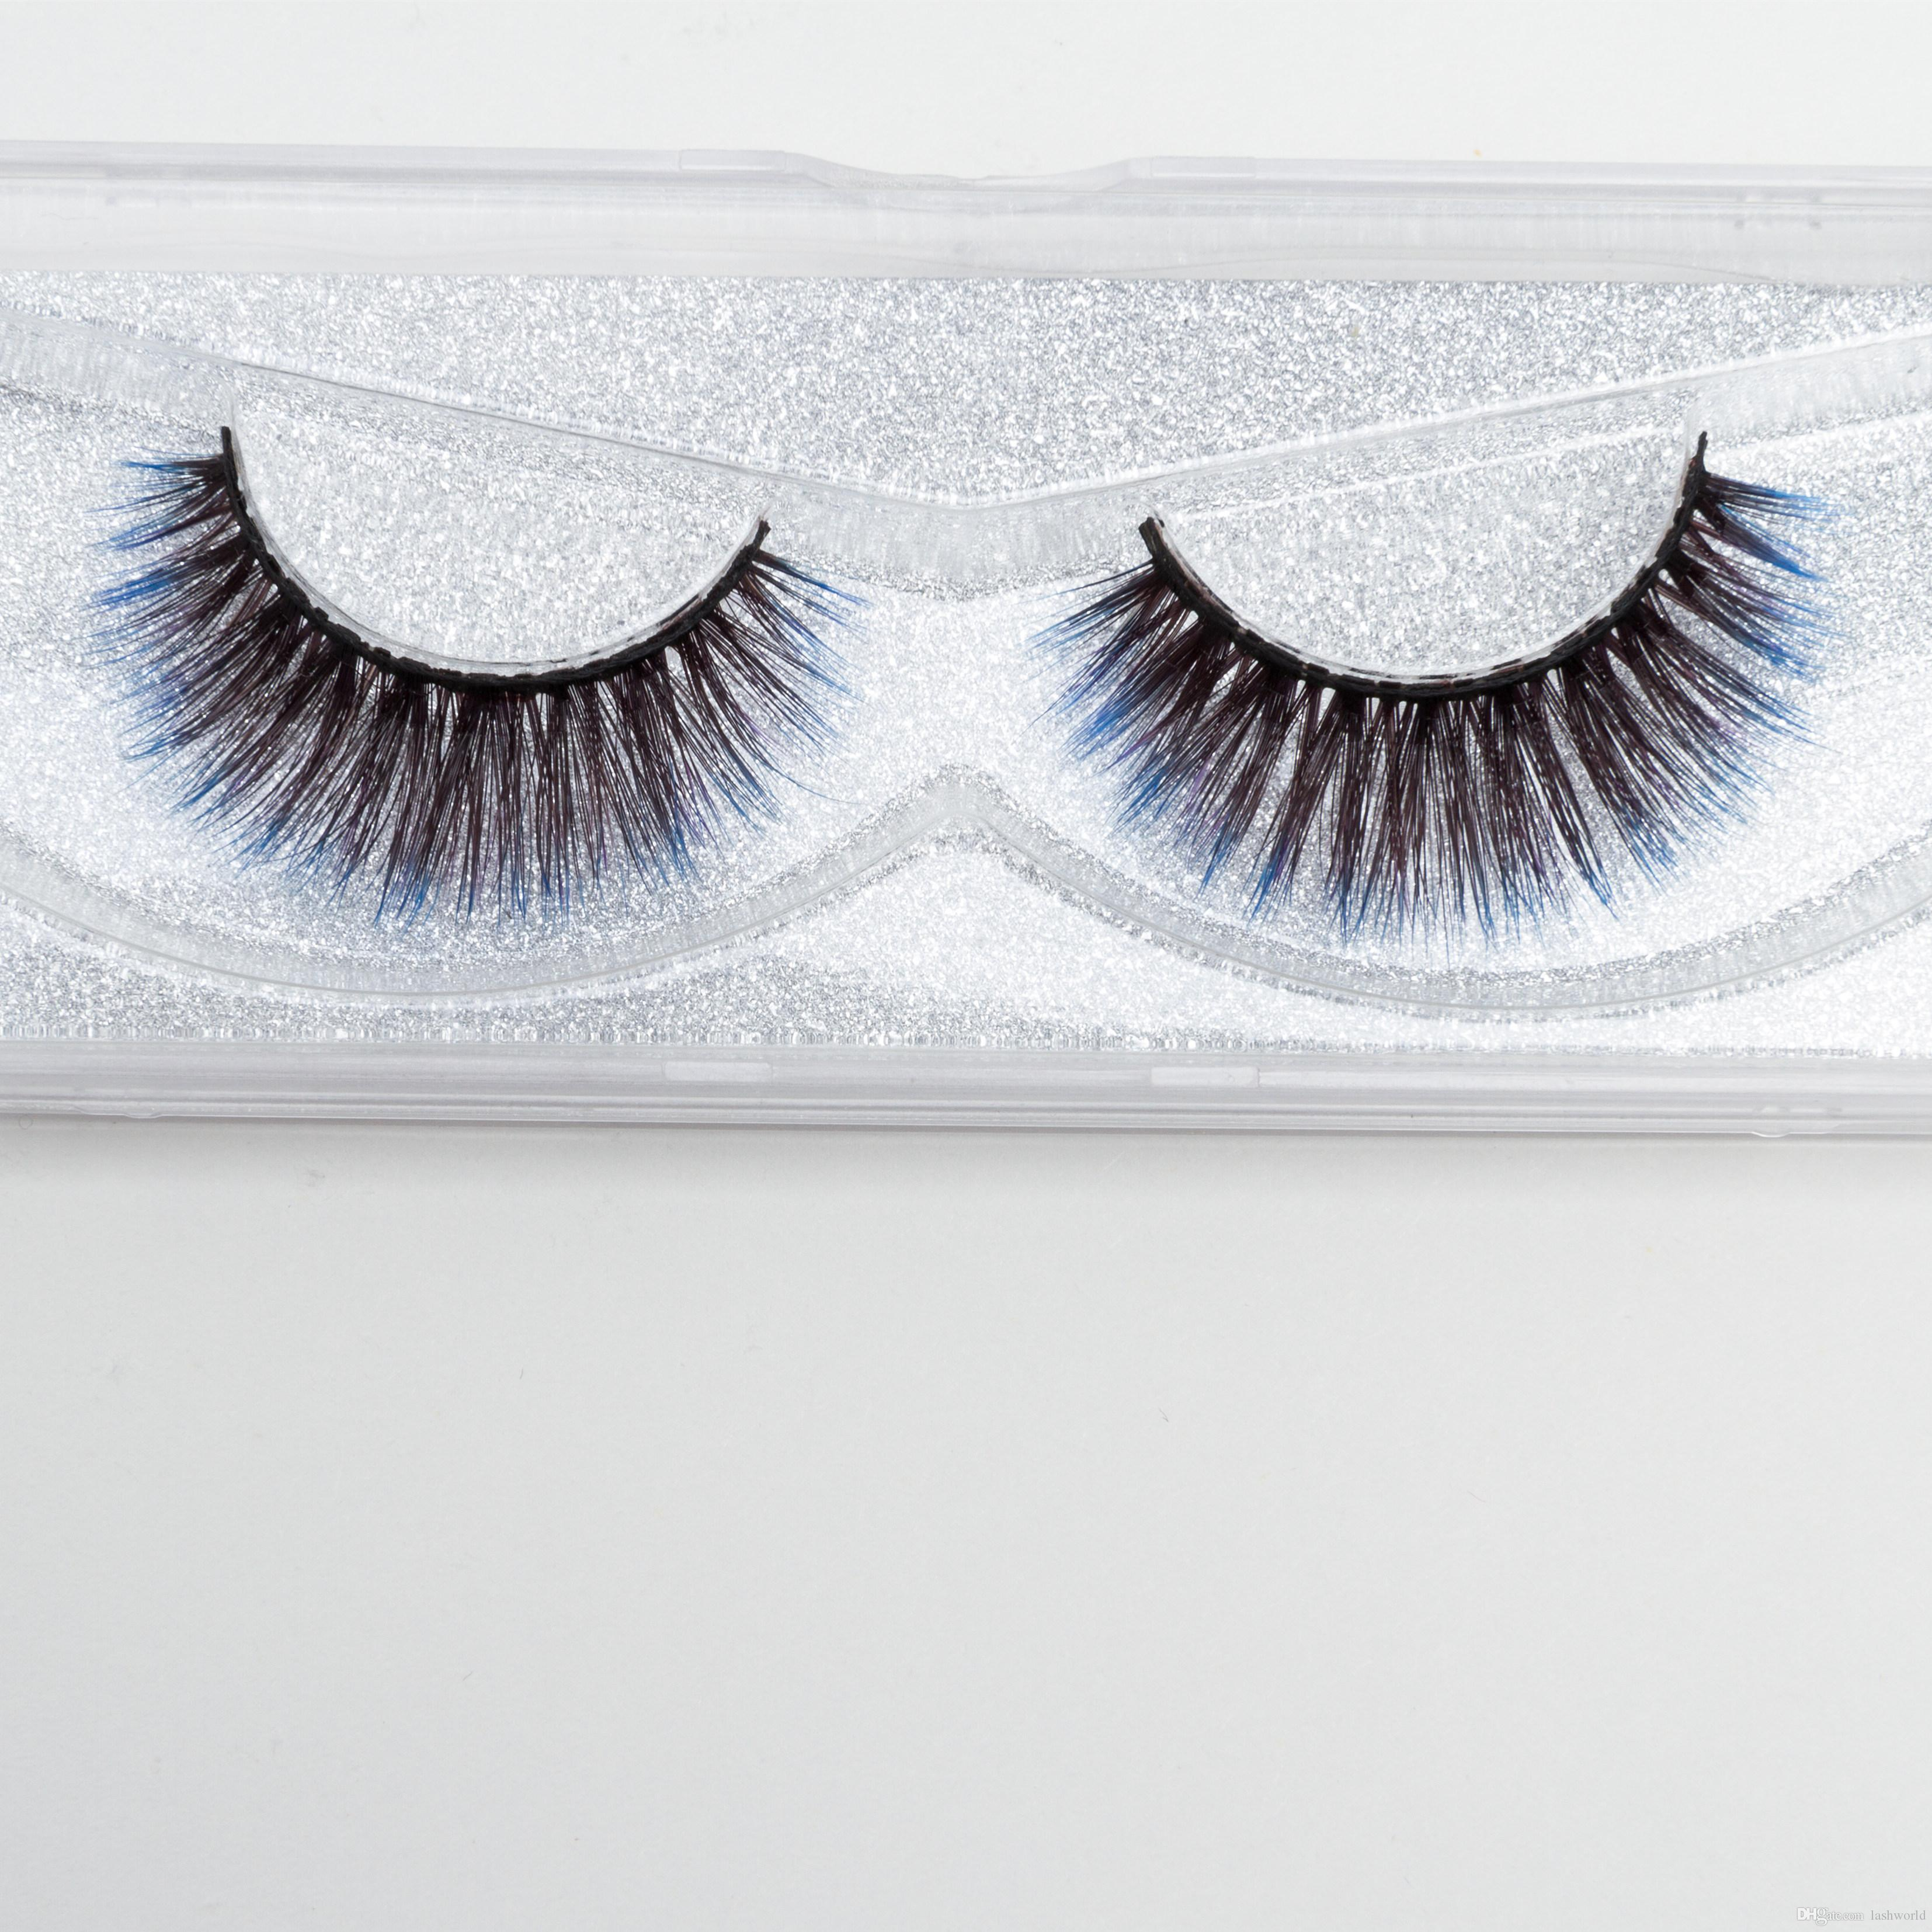 Venta directa de la fábrica de Seashine 3d seda sintética Natural look pestañas azules pestañas coloridas envío gratis C11